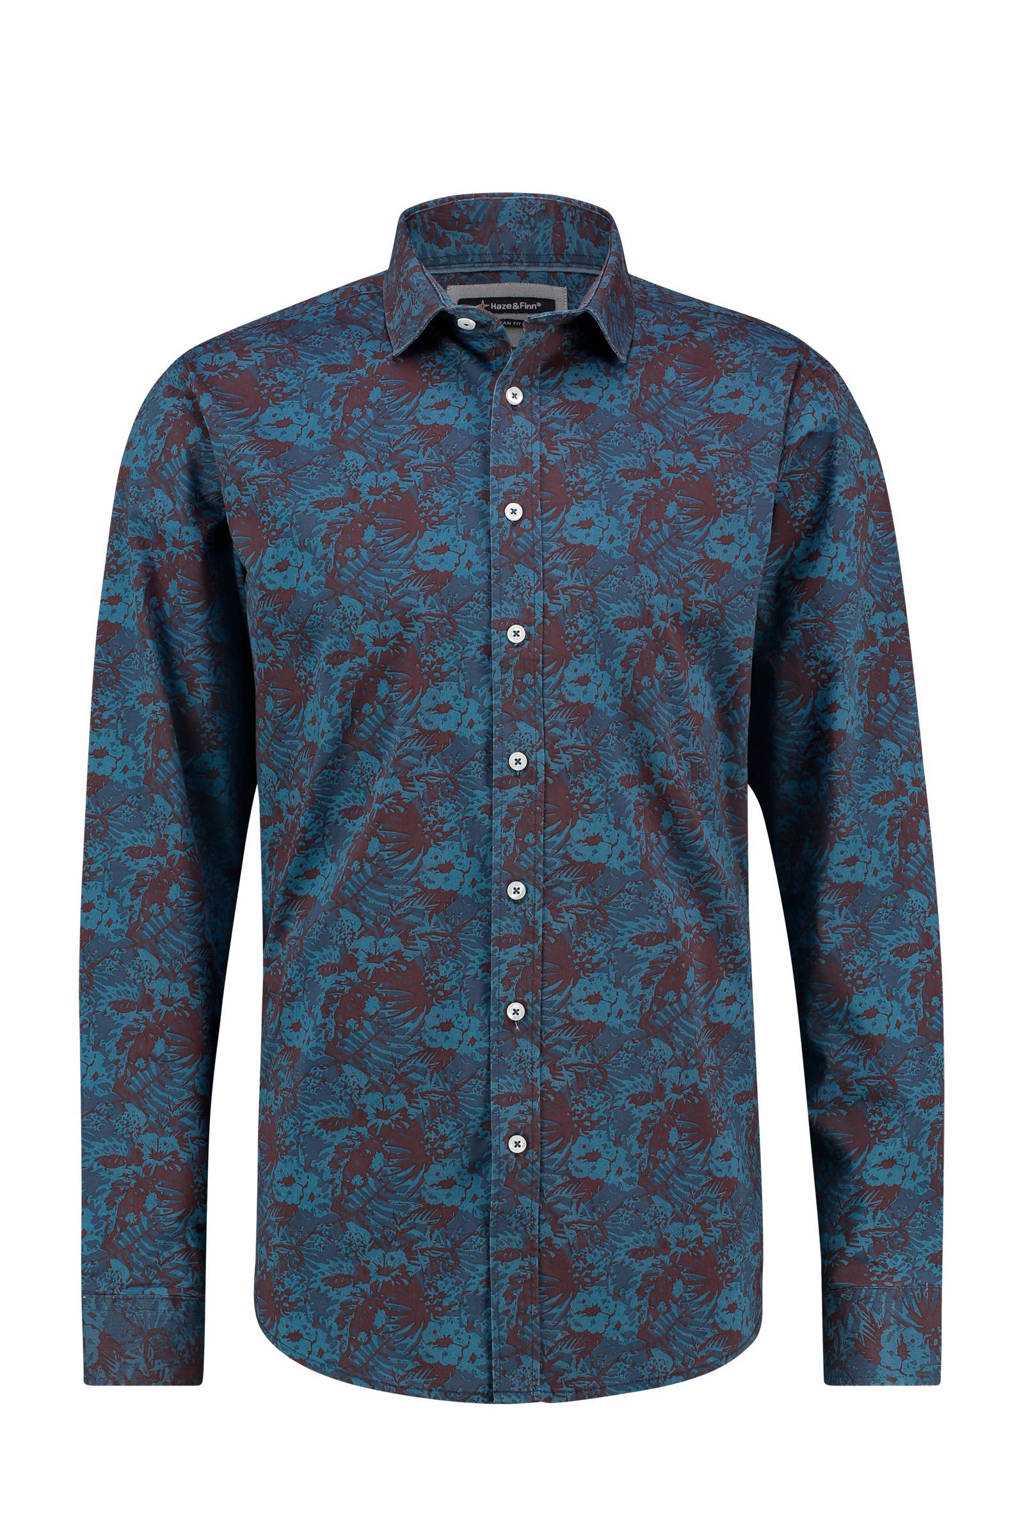 Haze & Finn overhemd met all over bladprint blauw, Blauw/bruin